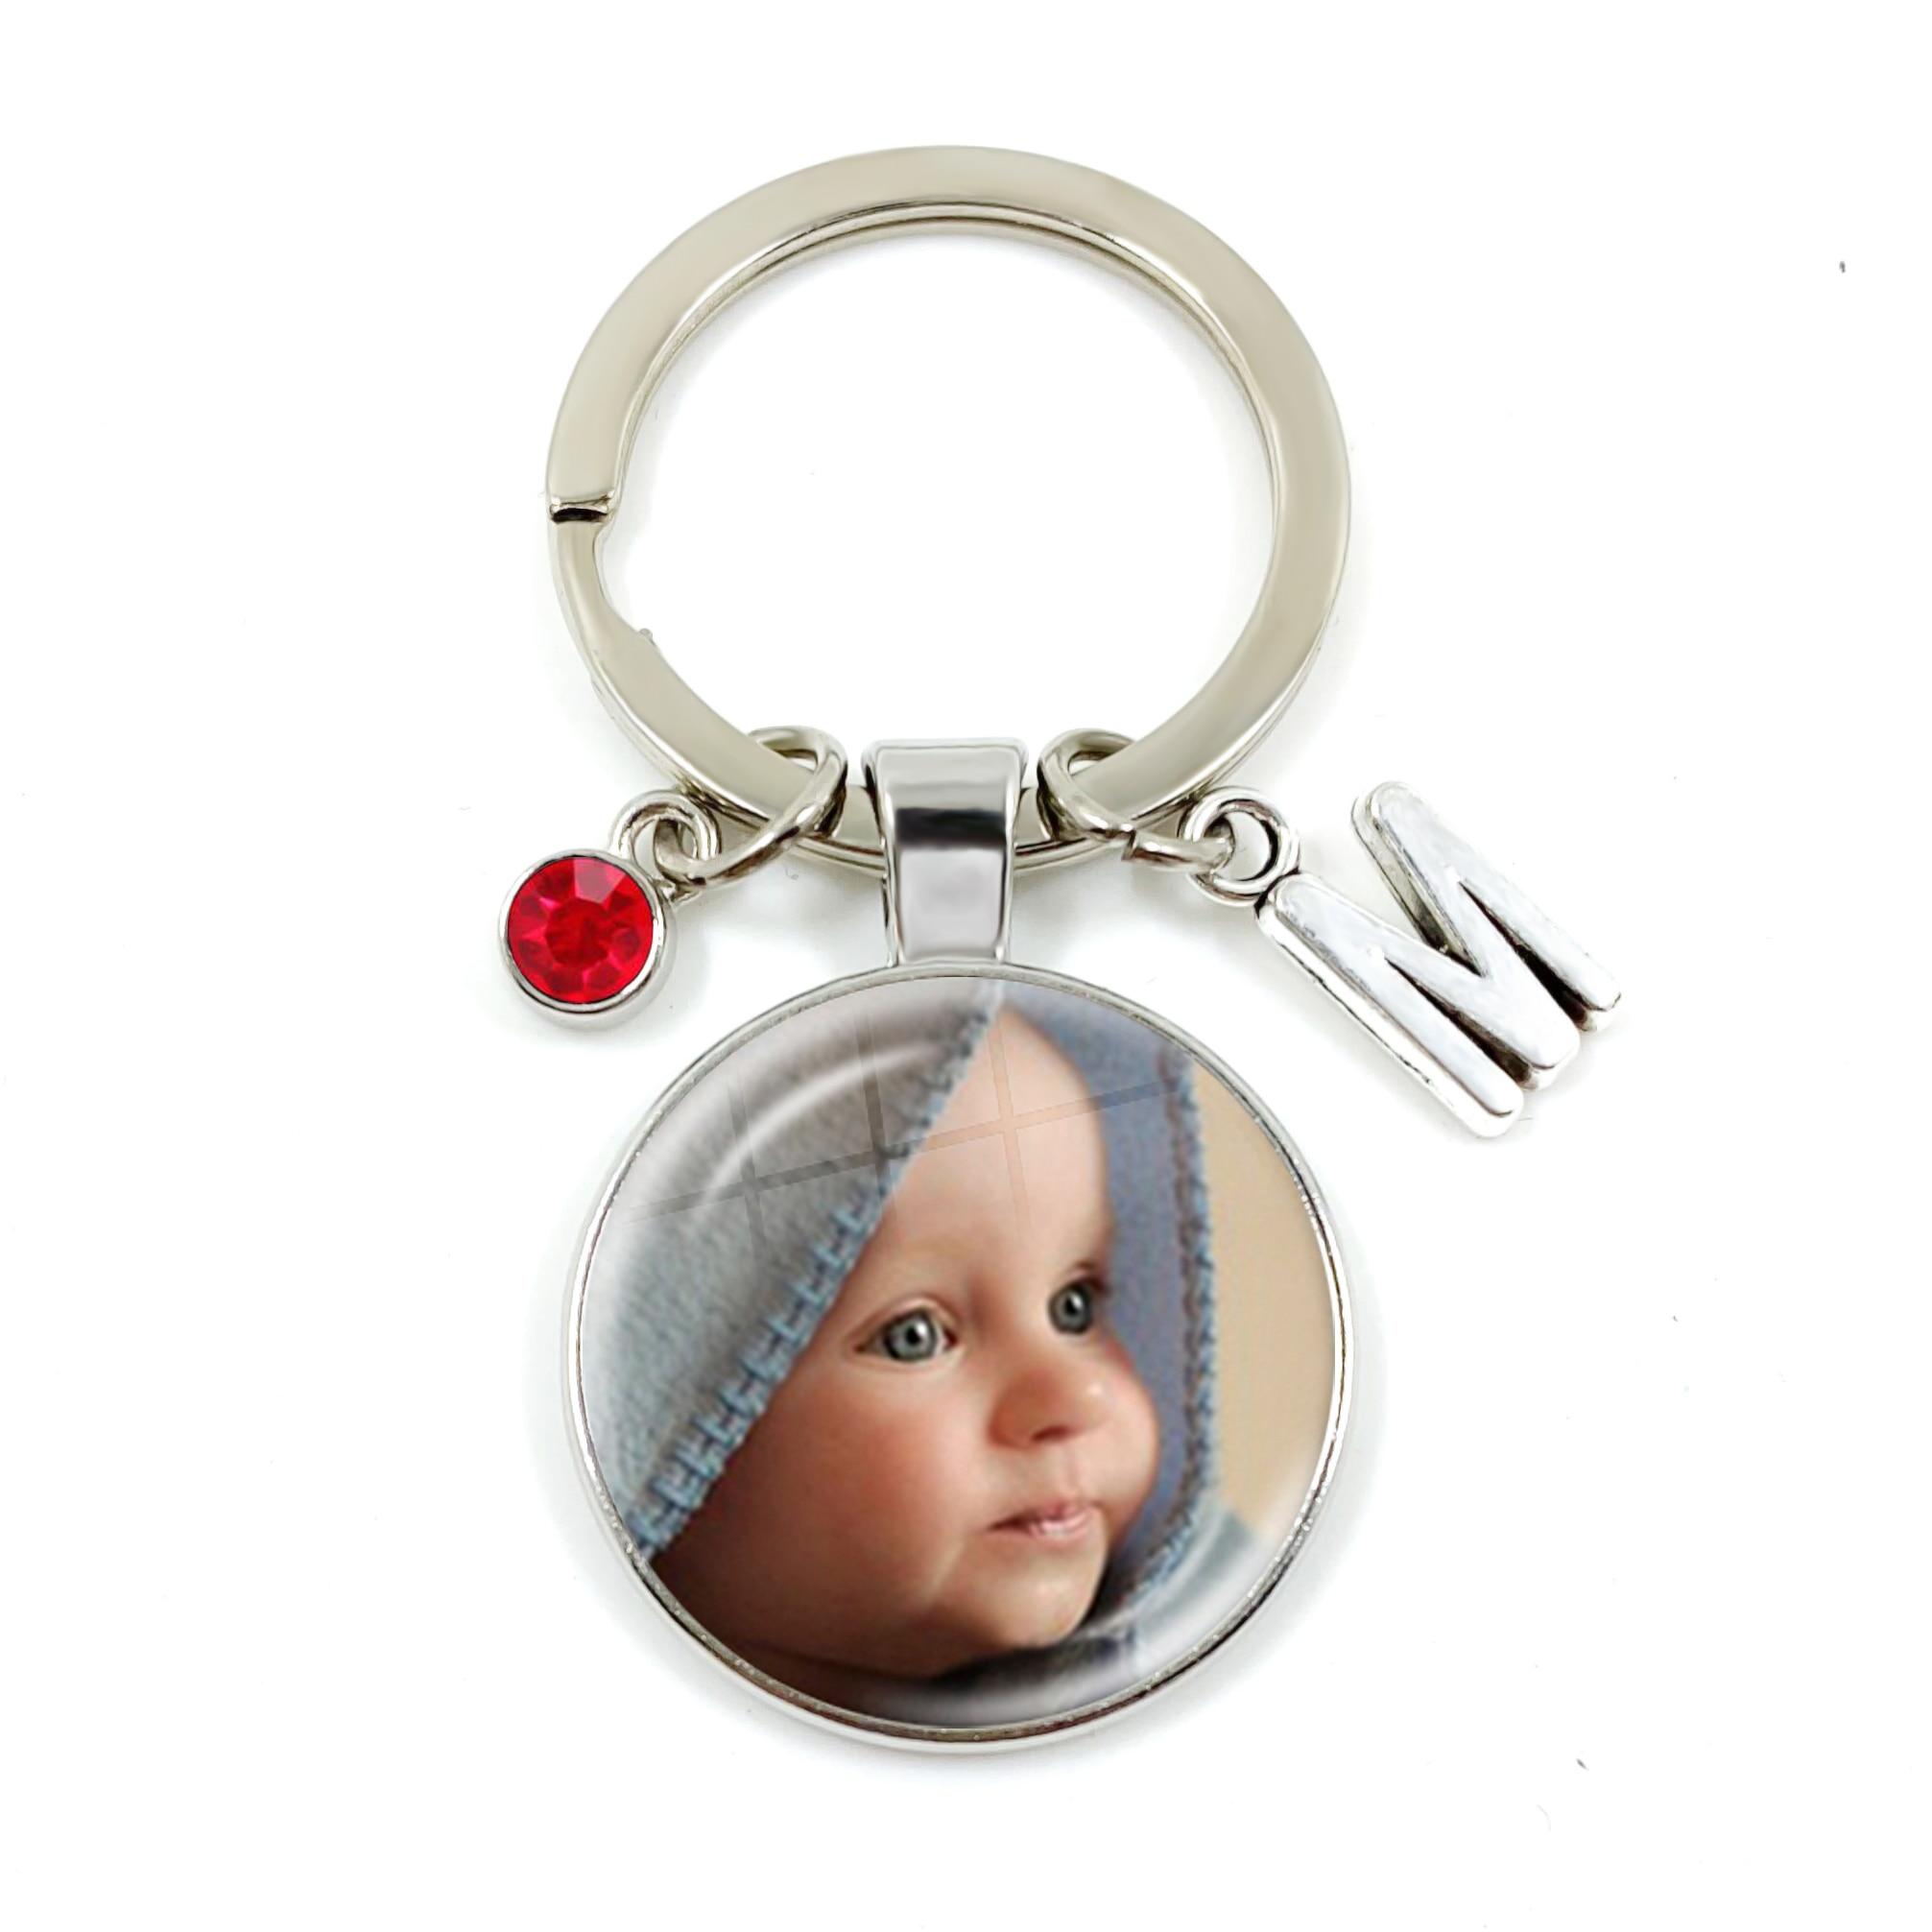 Personalized Custom Keychain Birthstone 26 Letters Photo Mum Dad Baby Children Grandpa Parents Pendant Keyholder Keyring Gift